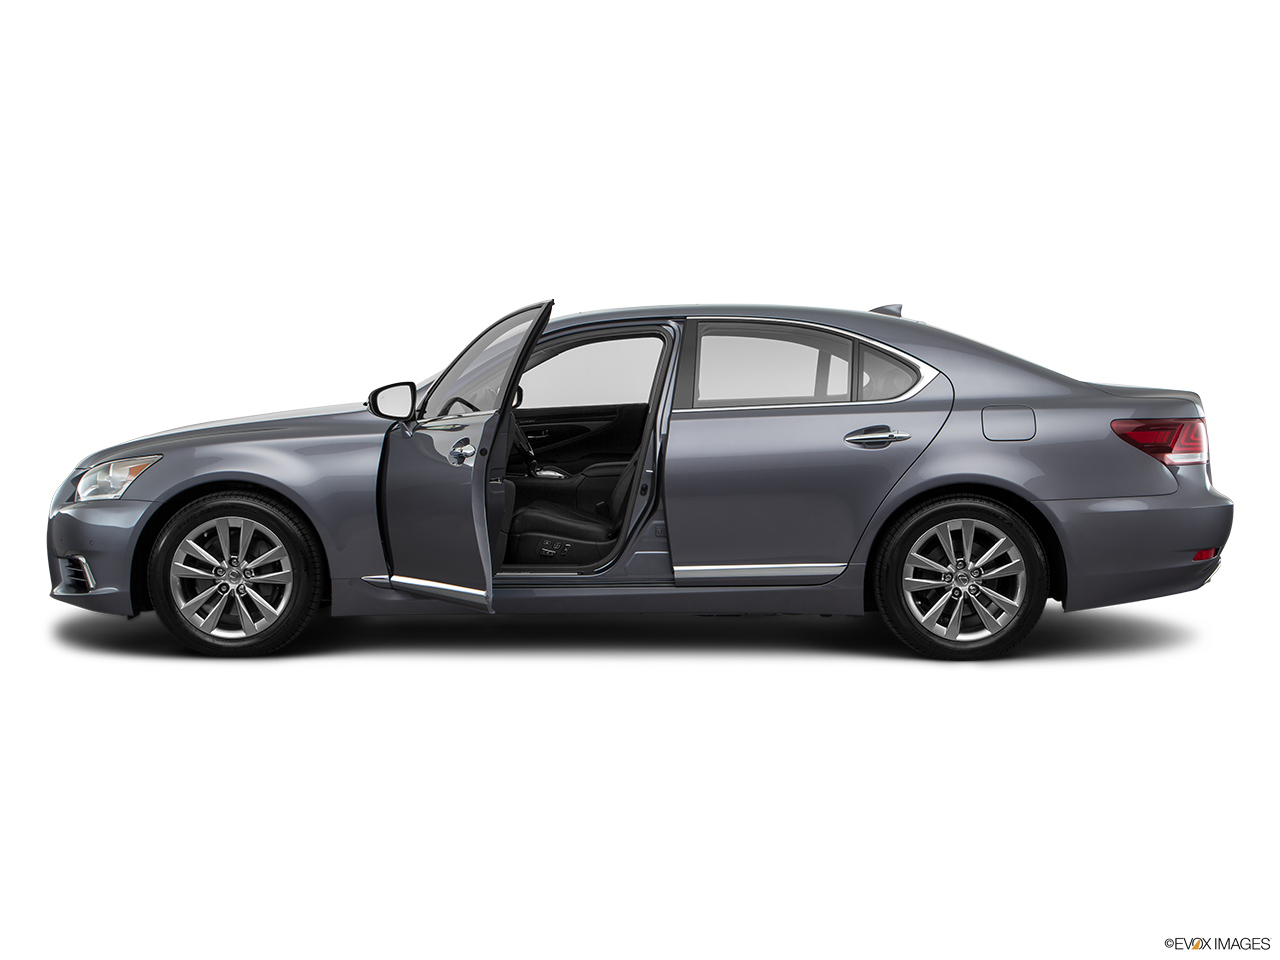 car features list for lexus ls 2016 460 f sport swb qatar yallamotor. Black Bedroom Furniture Sets. Home Design Ideas